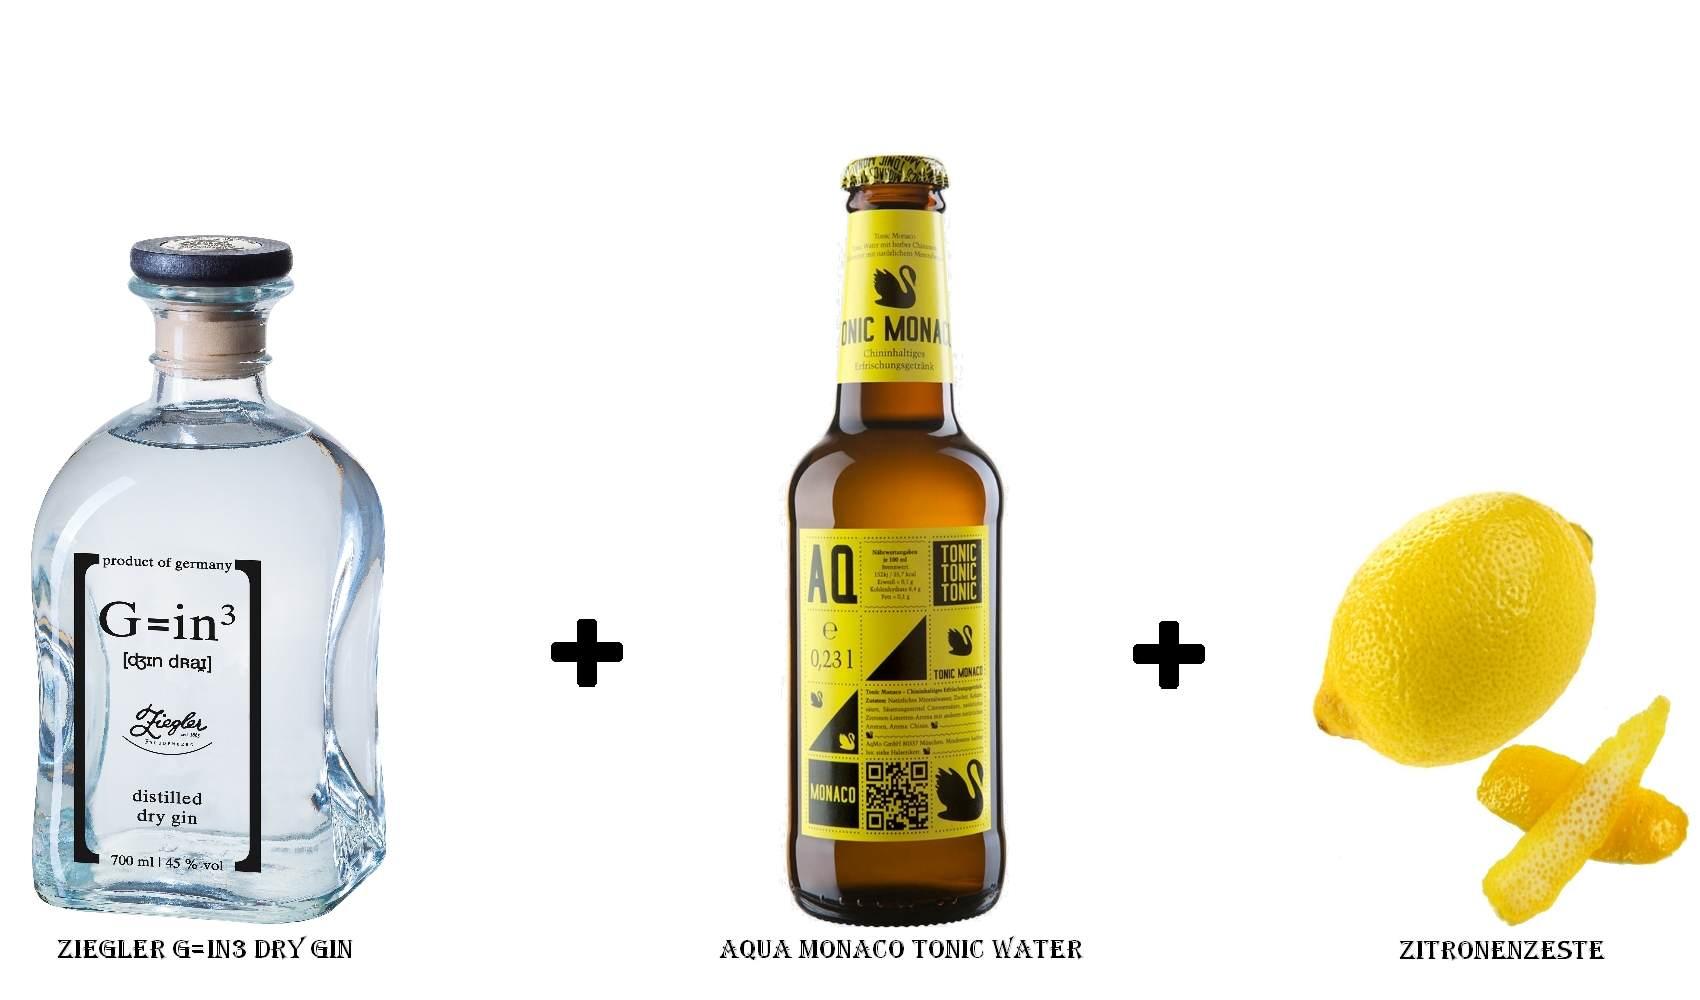 Ziegler G=in3 Dry Gin + Aqua Monaco Tonic Water + Zitronenzeste